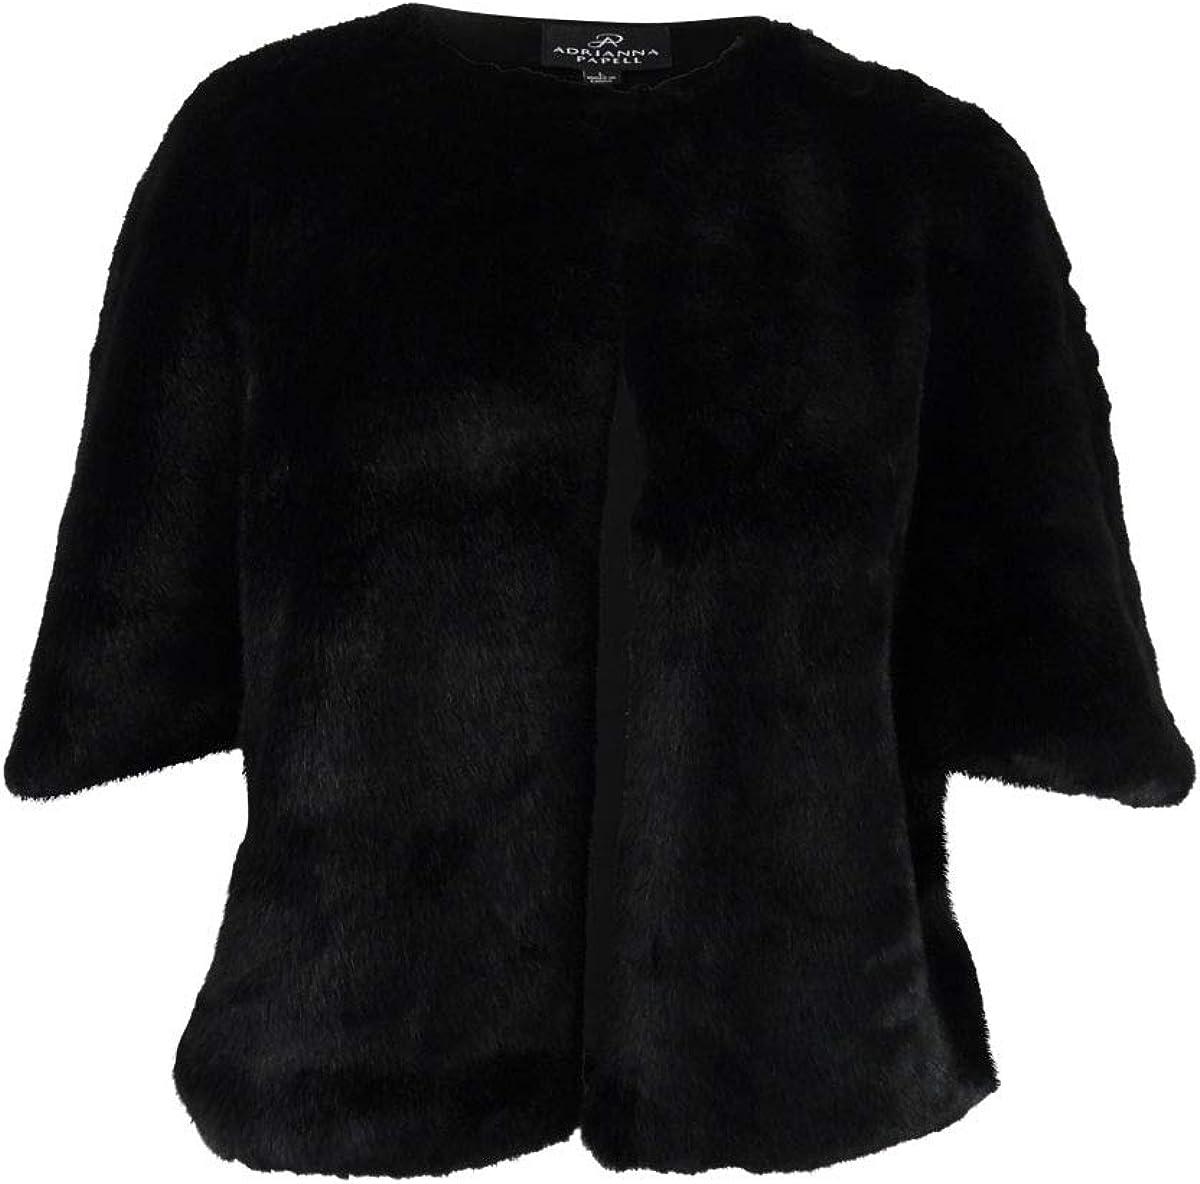 Adrianna Papell womens FAUX FUR JACKET Faux-Fur Coat